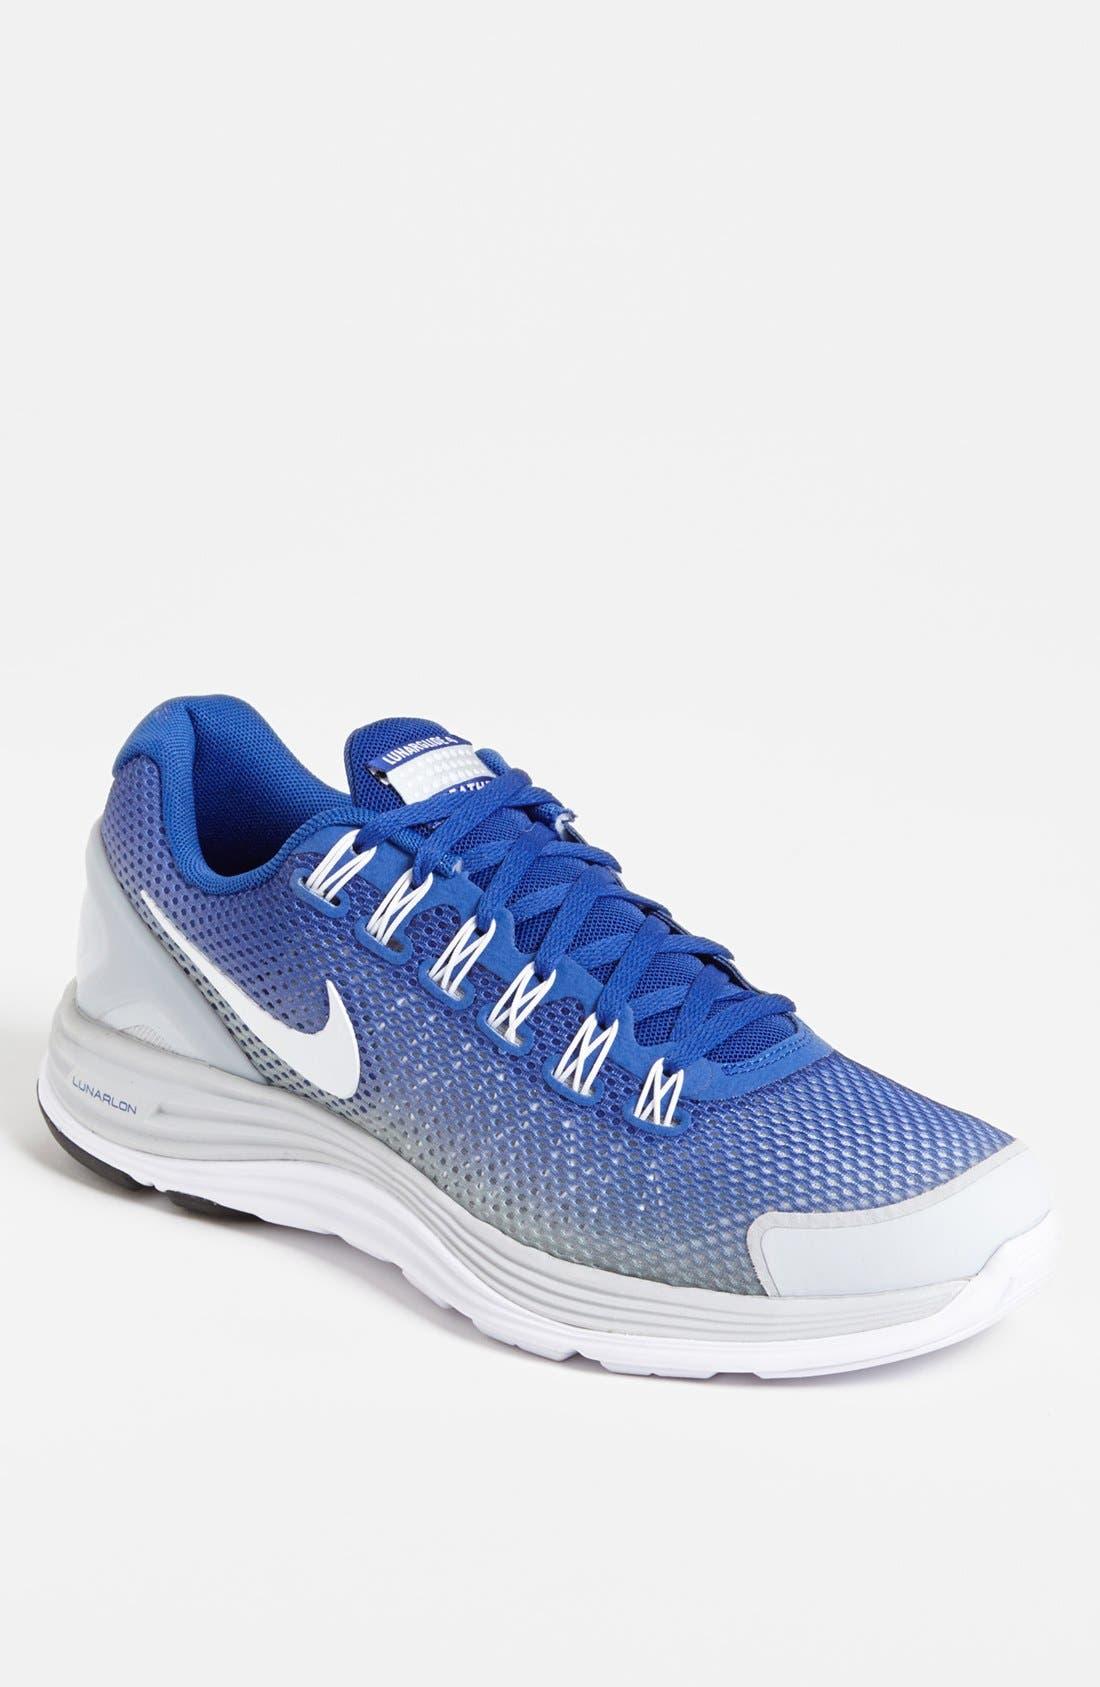 Alternate Image 1 Selected - Nike 'LunarGlide+ 4 Breathe' Running Shoe (Men)